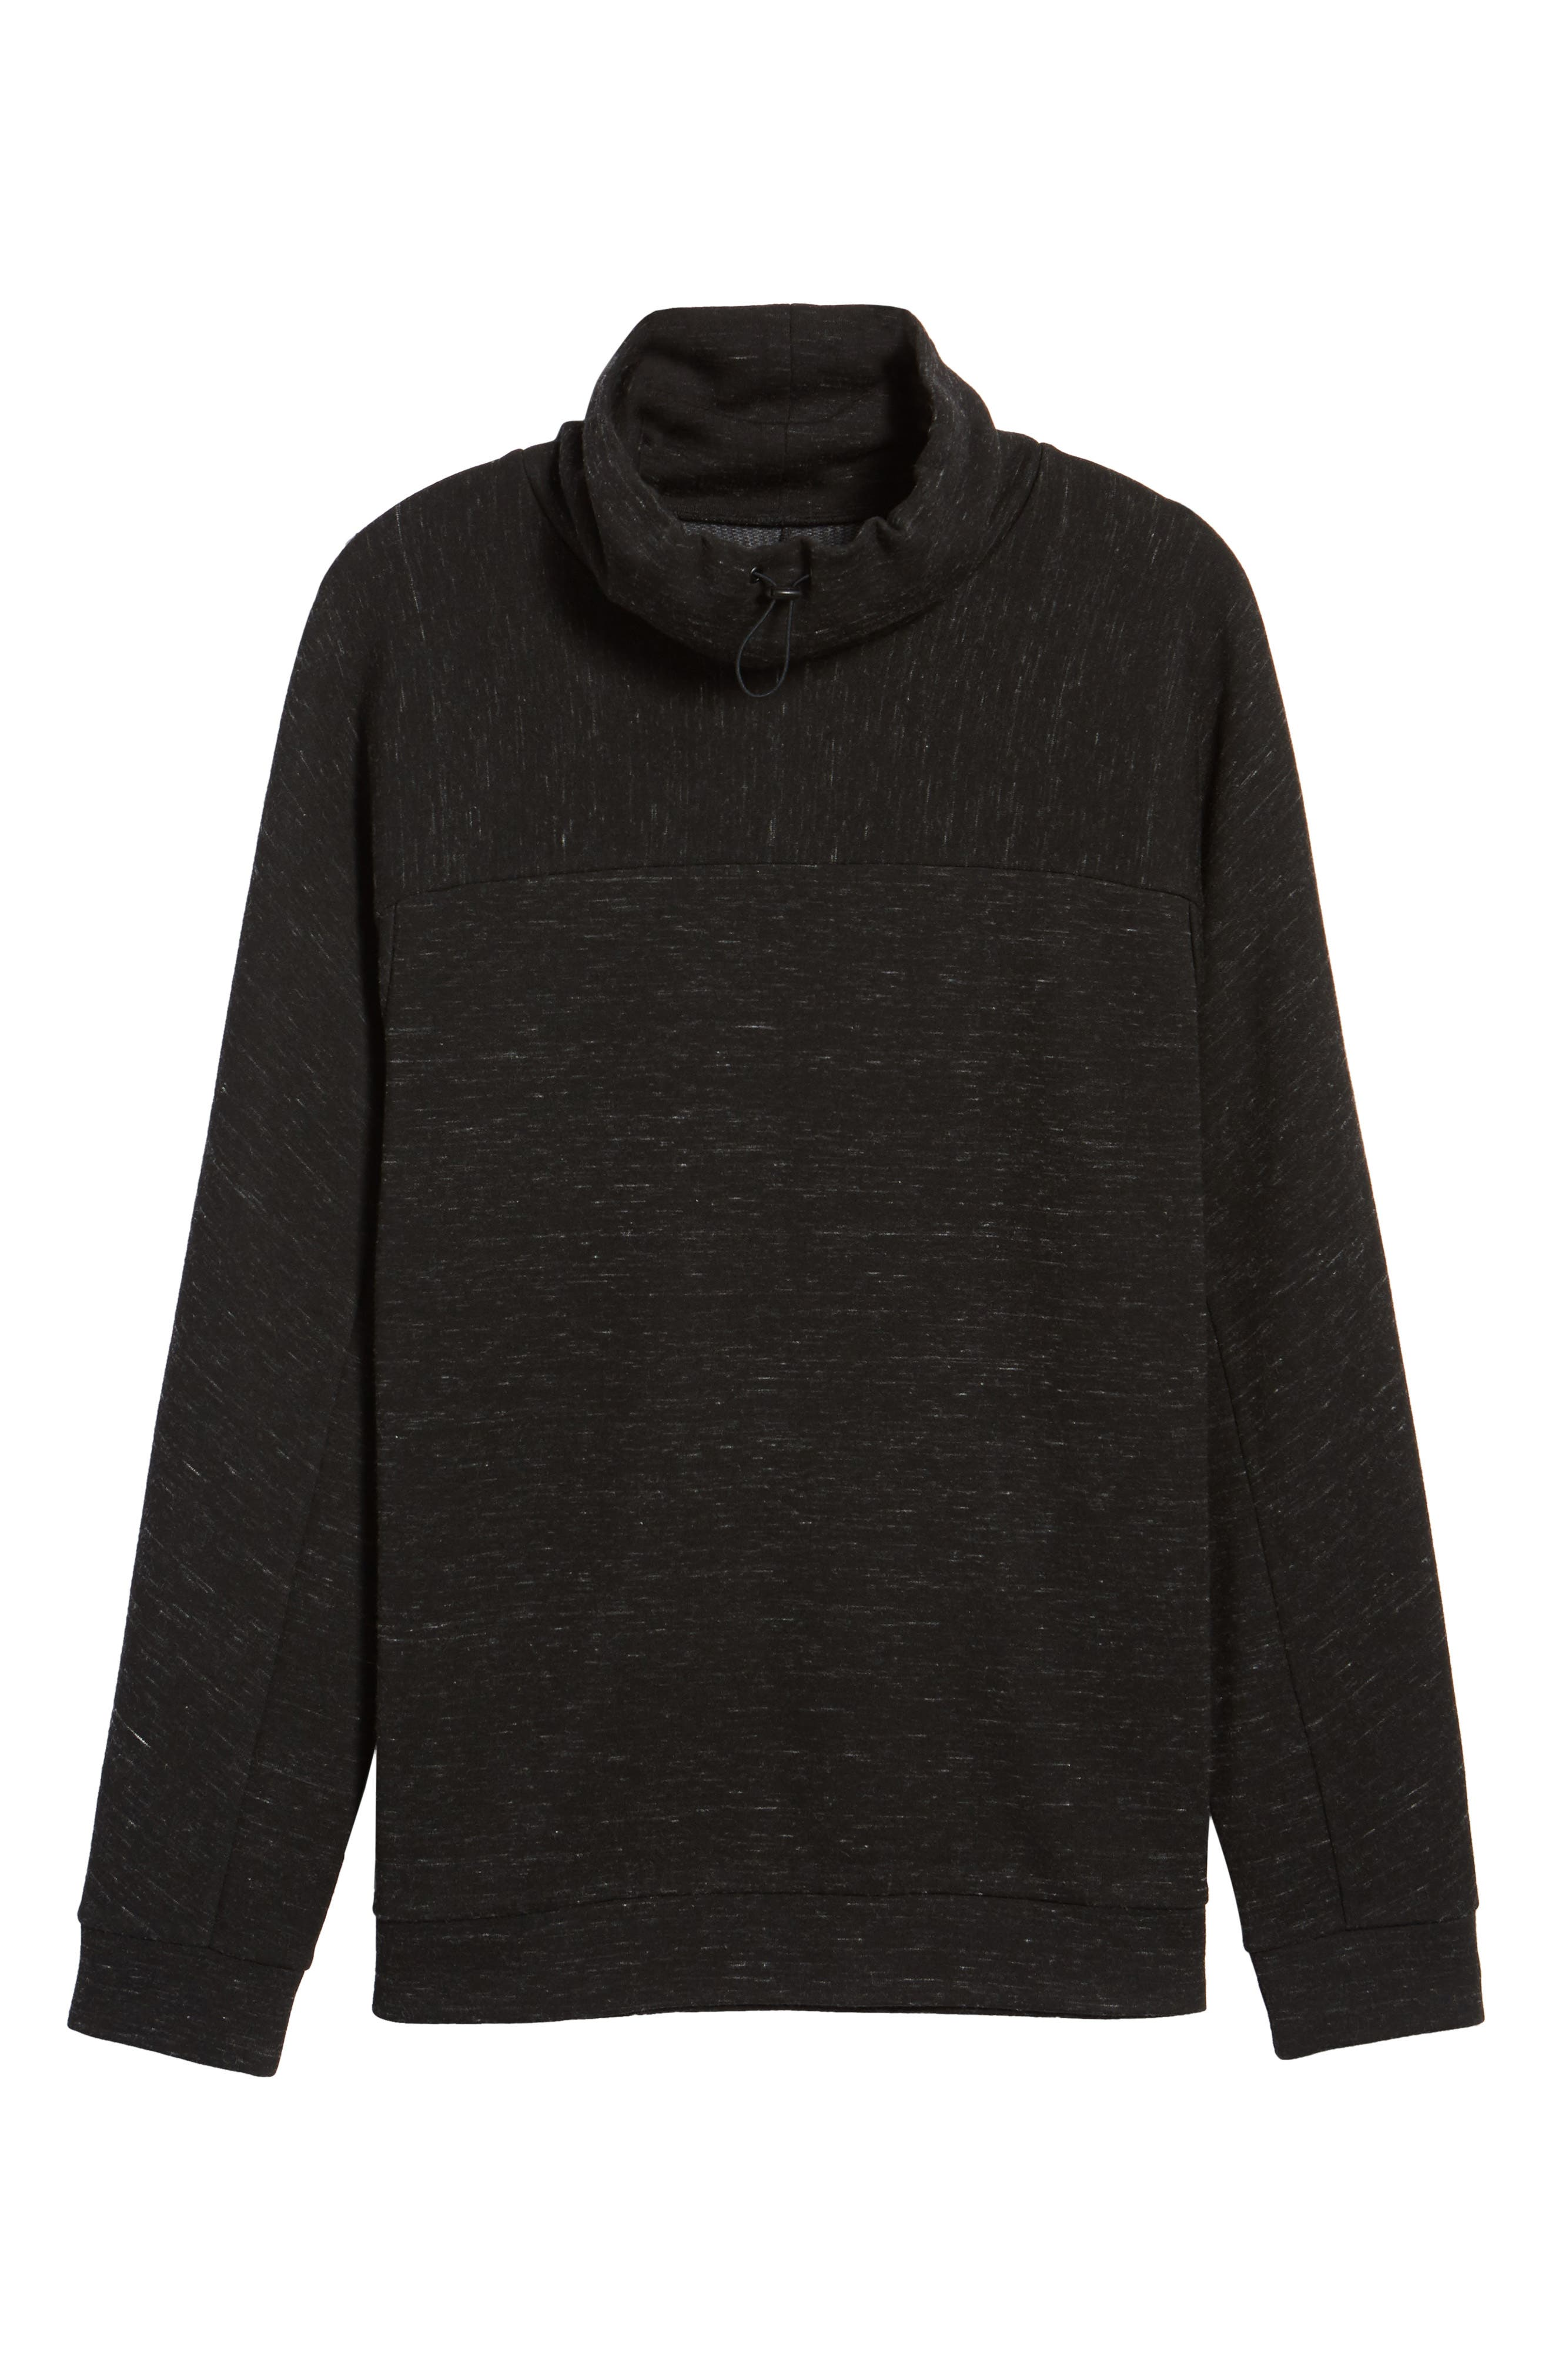 Space Dye Fleece Pullover,                             Alternate thumbnail 6, color,